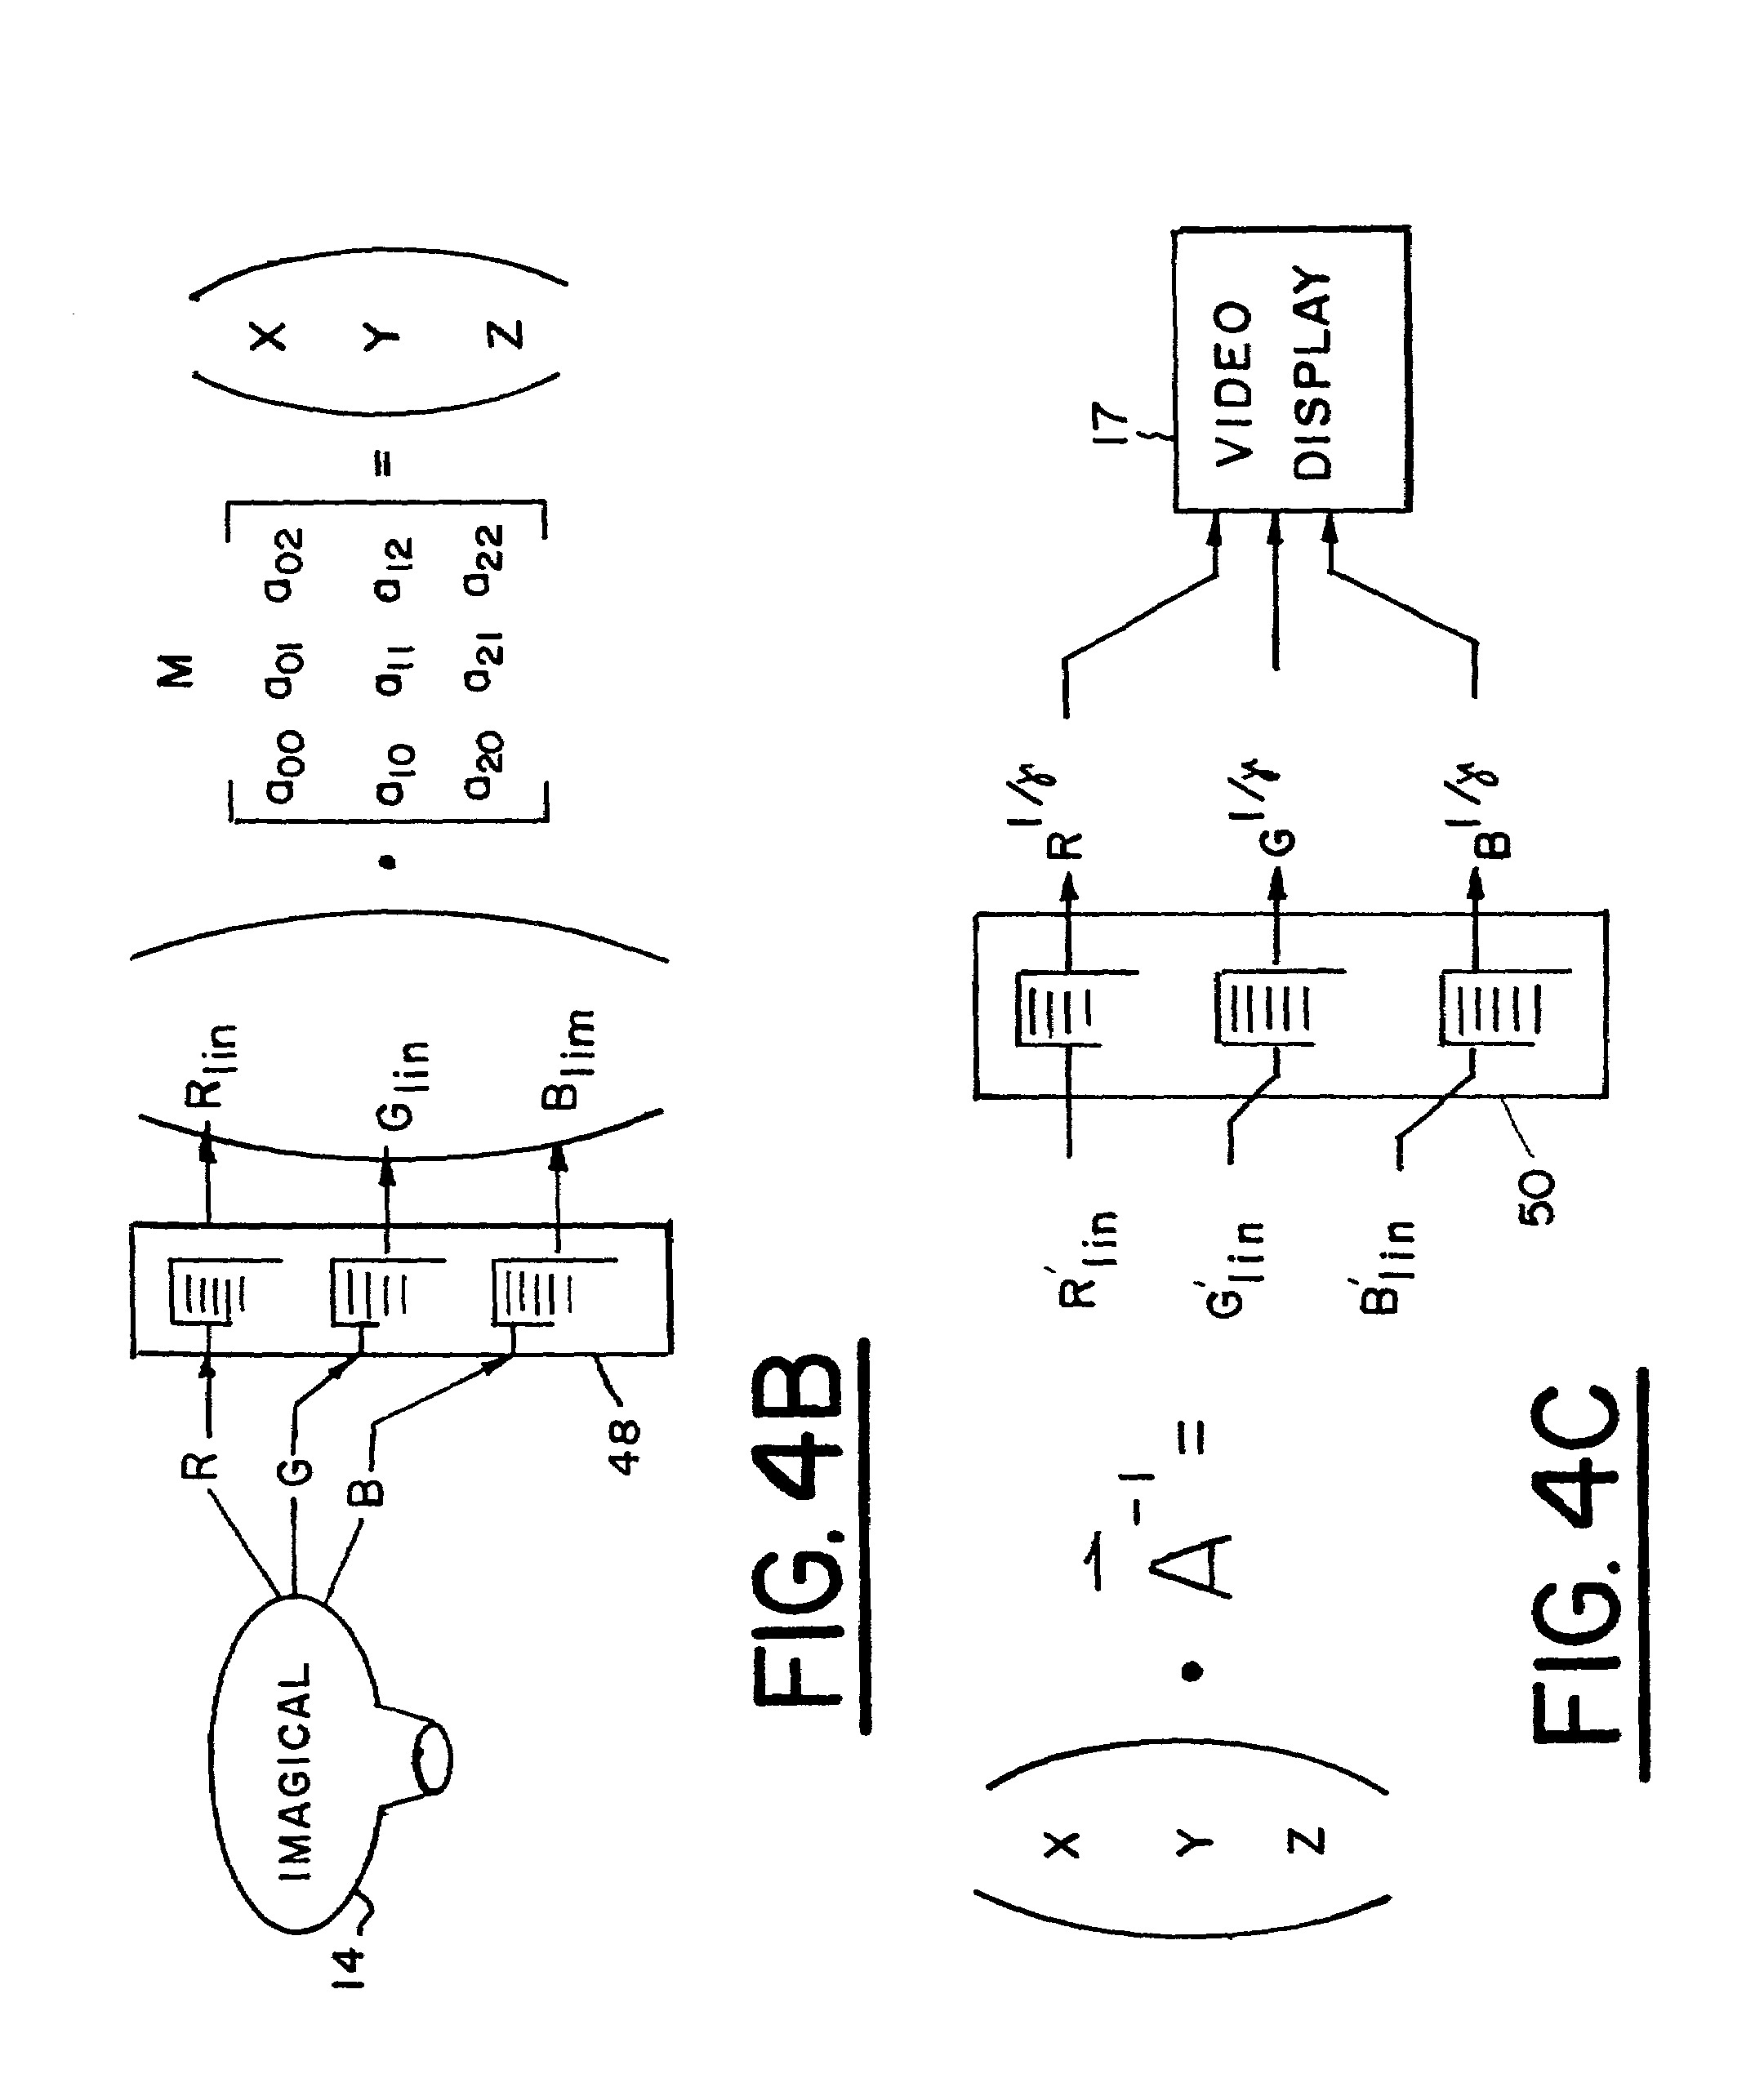 Patent US 6,995,870 B2